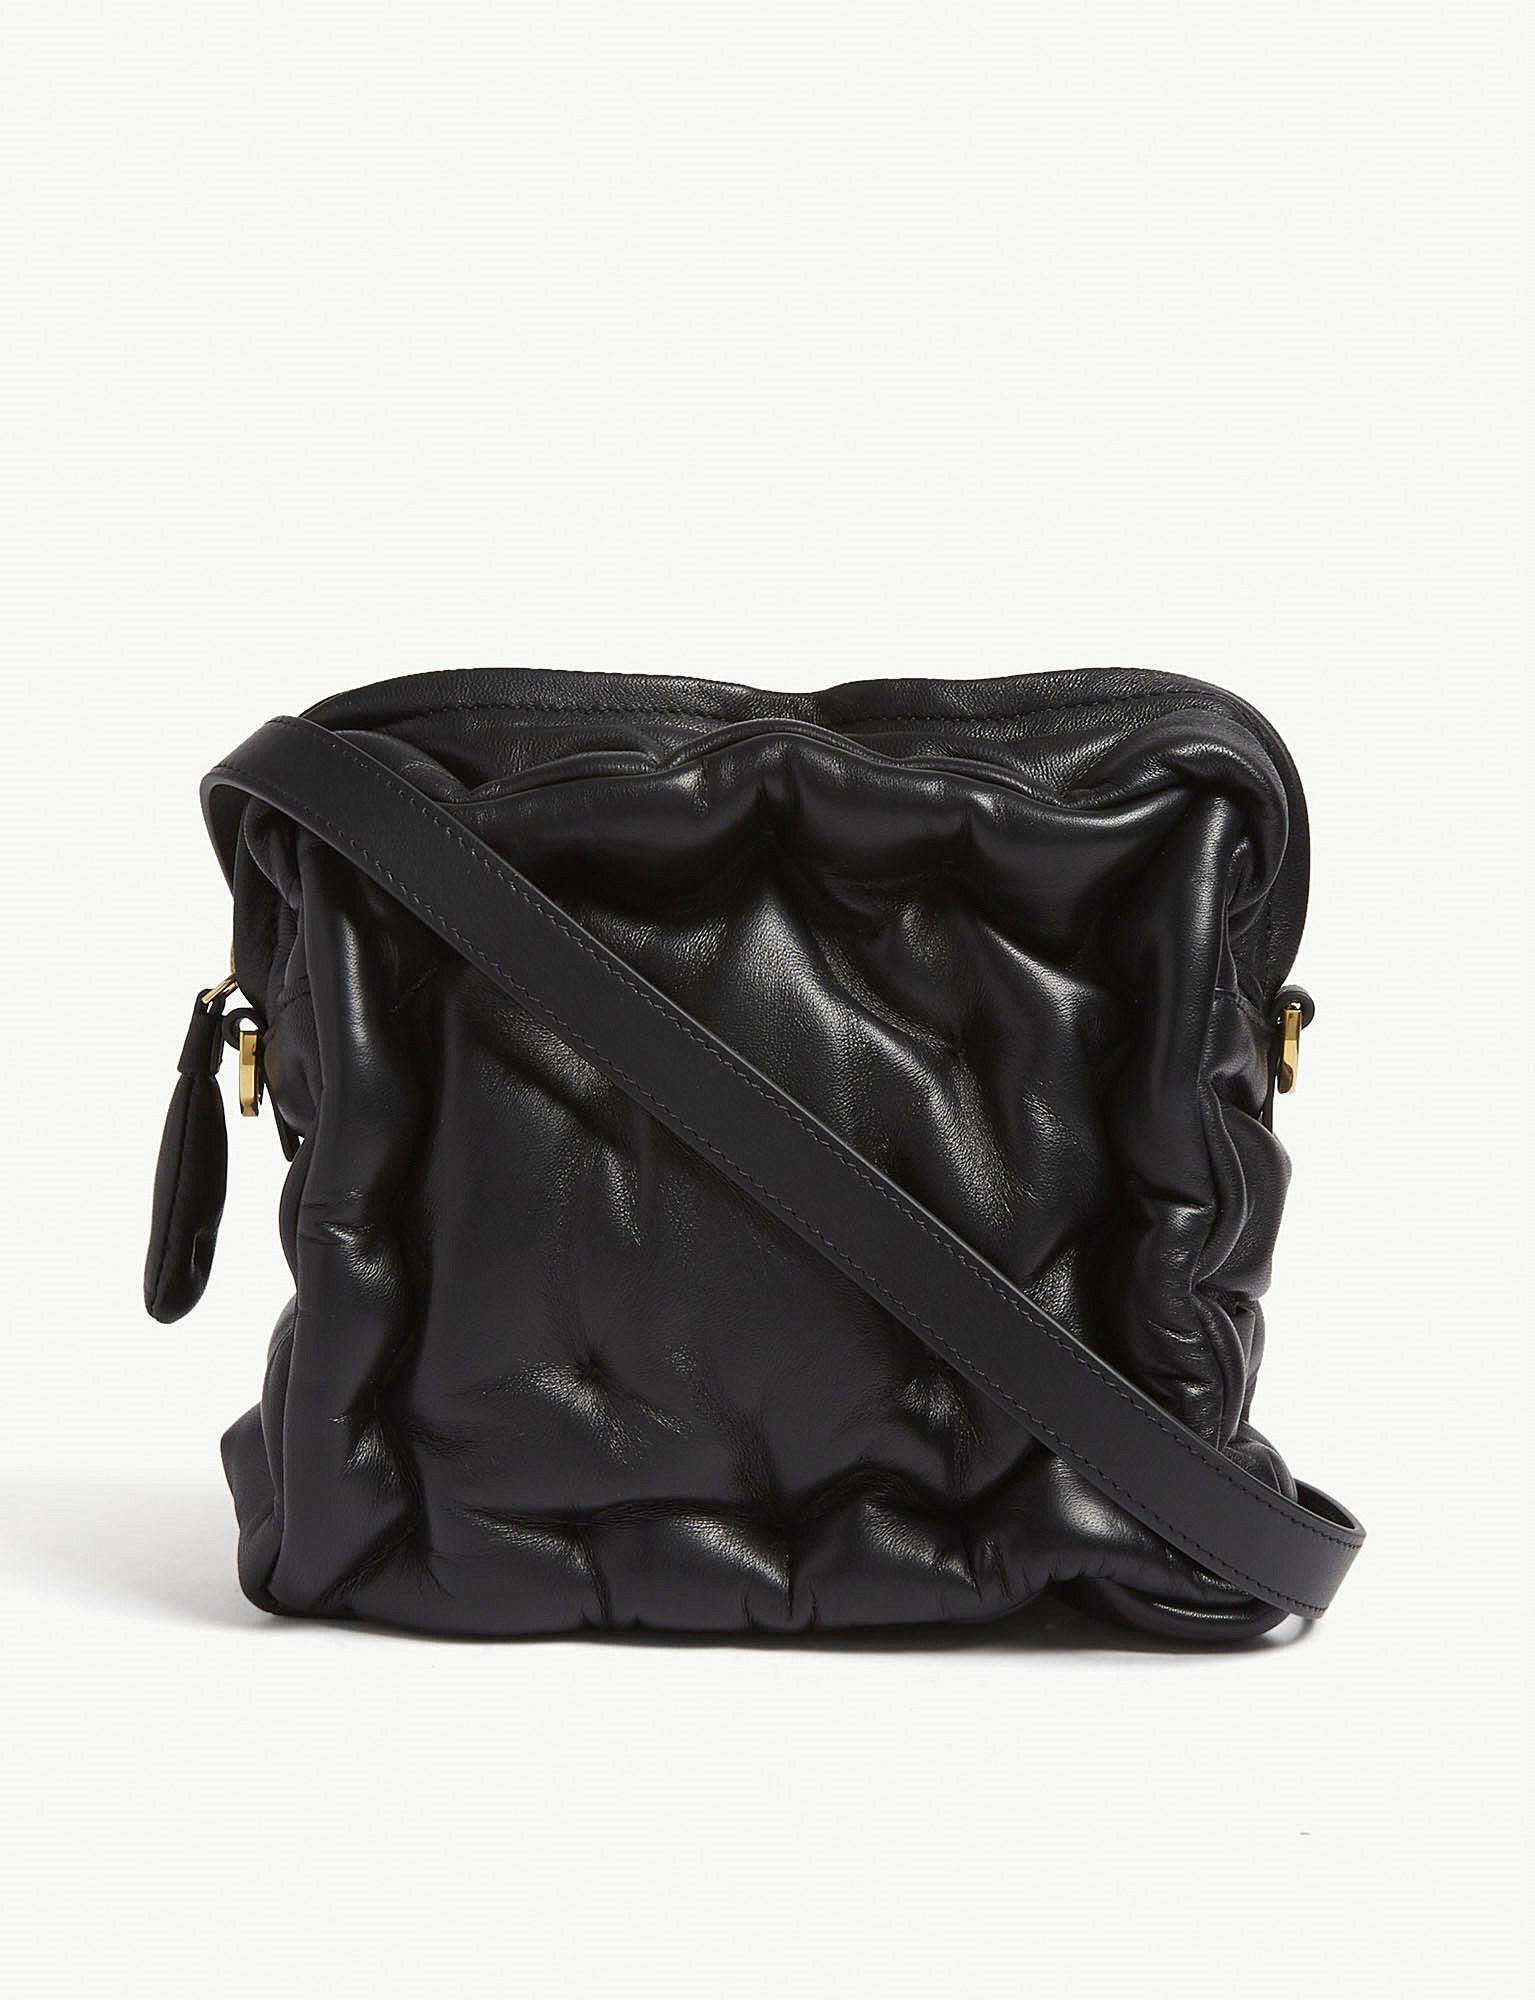 Chubby Barrel Crossbody Bag in Blue Quilted Calf Leather Anya Hindmarch 5Li5MgeUYT